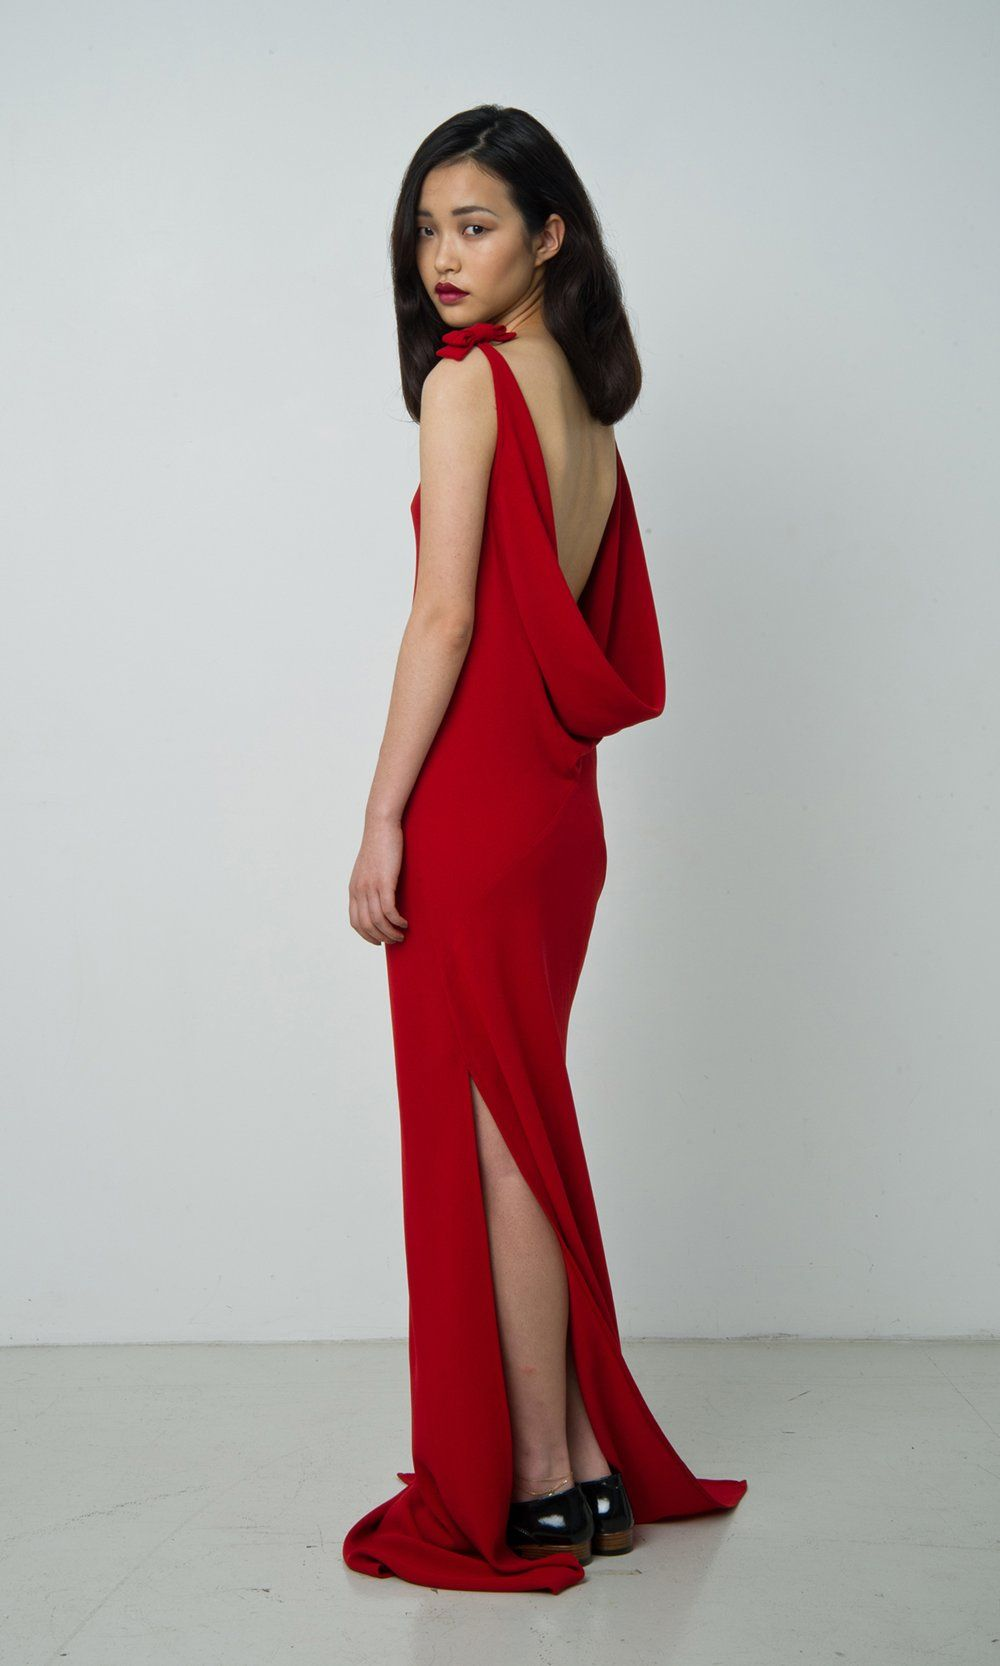 Liam Black Tie Dress Black Tie Dress Dresses Womens Formal Gowns